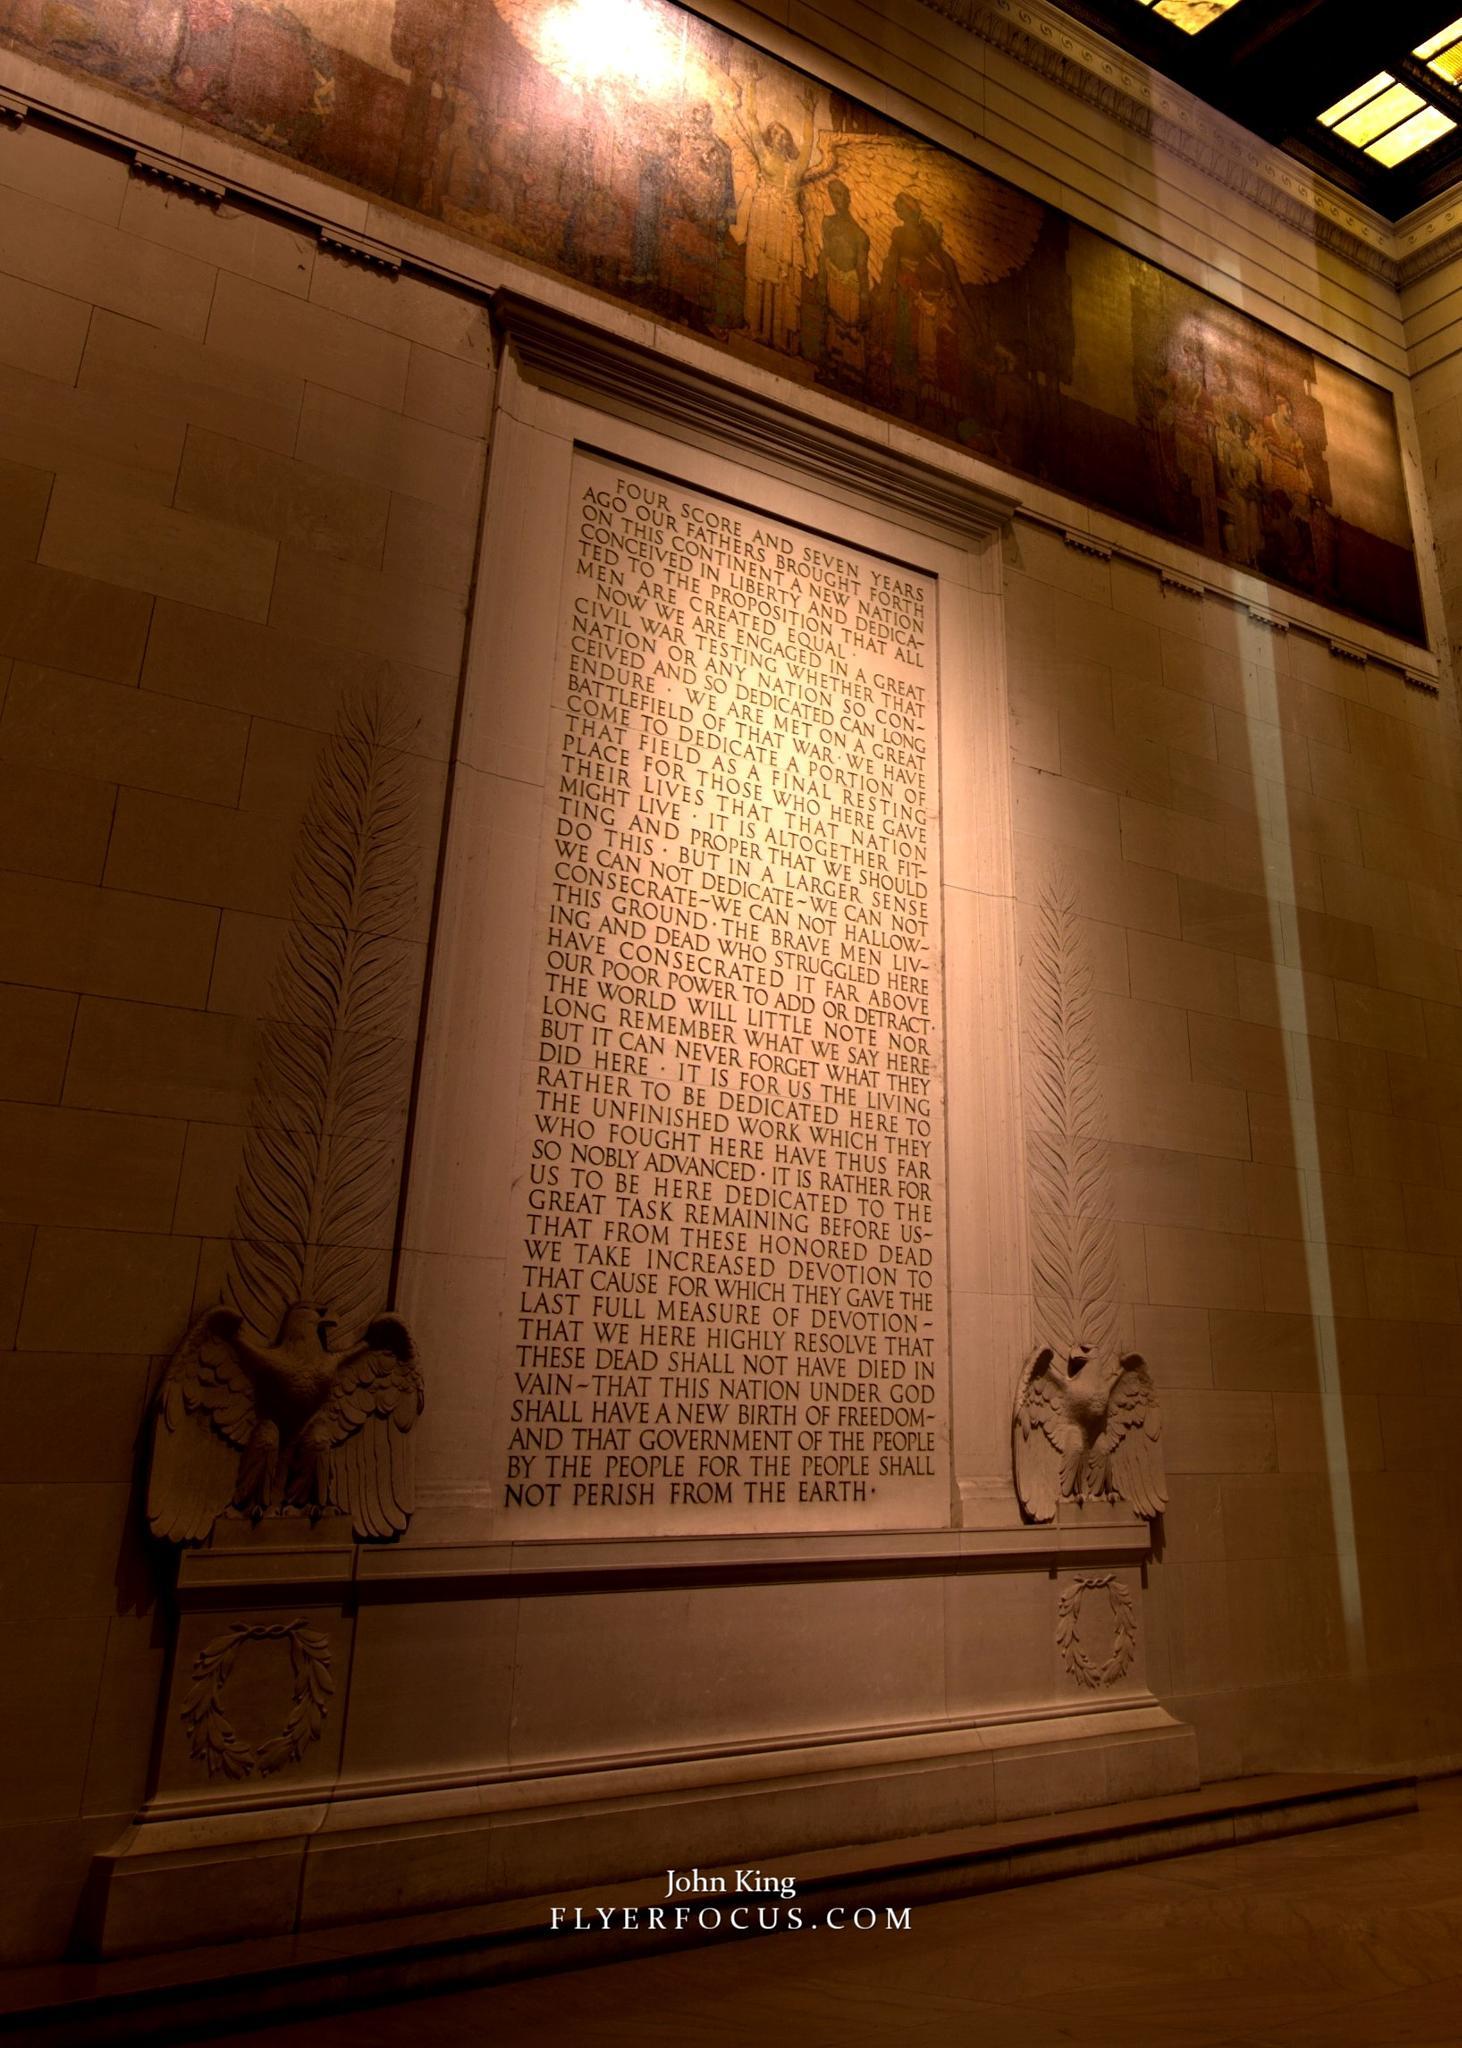 Gettysburg Address at Lincoln Memorial by John King